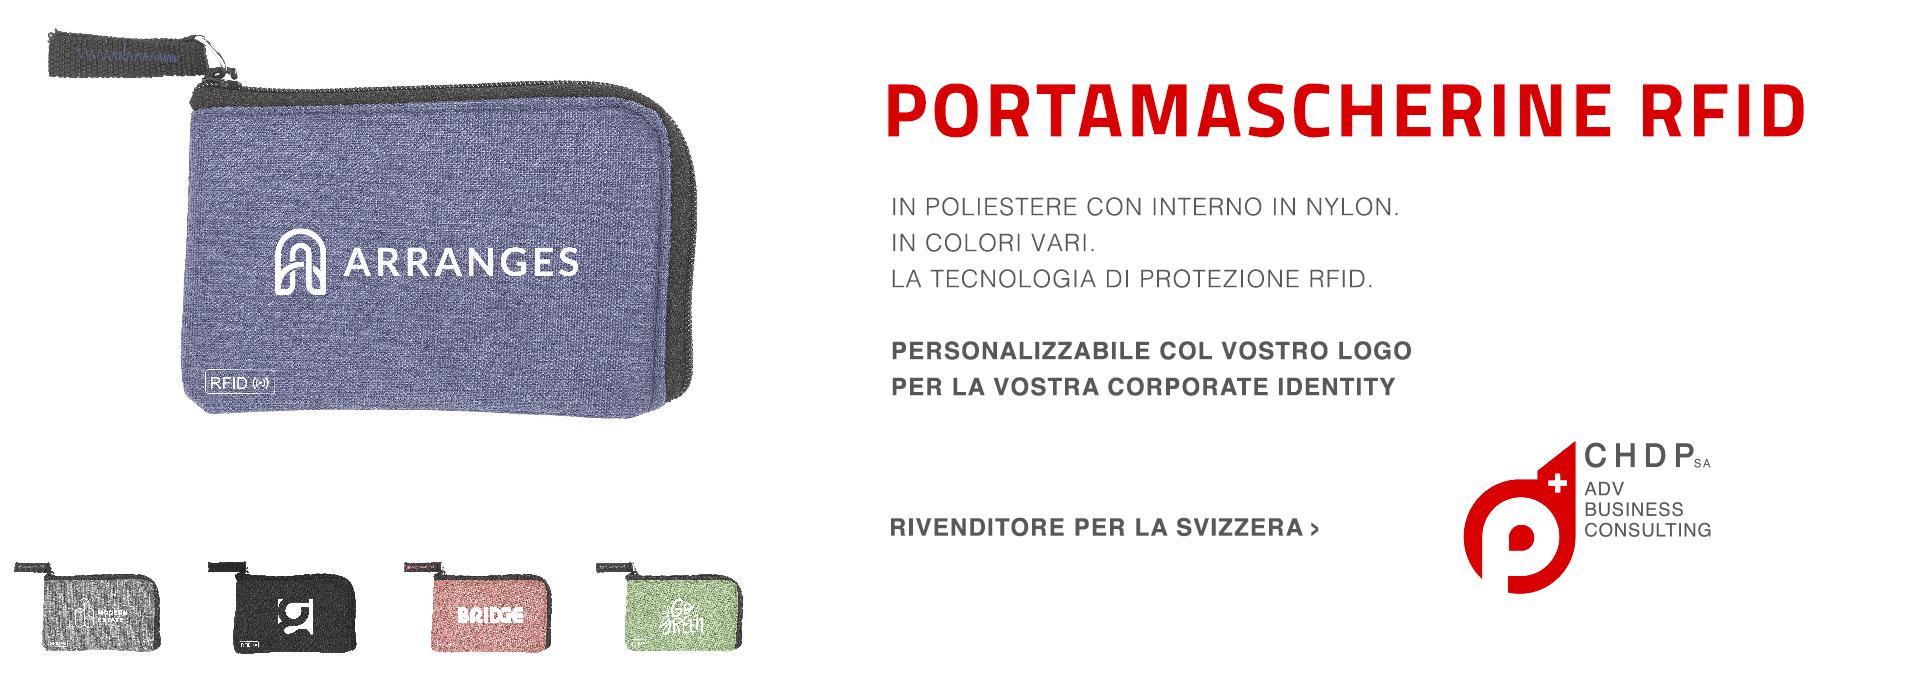 Portamascherine RFID. In poliestere con interno in nylon